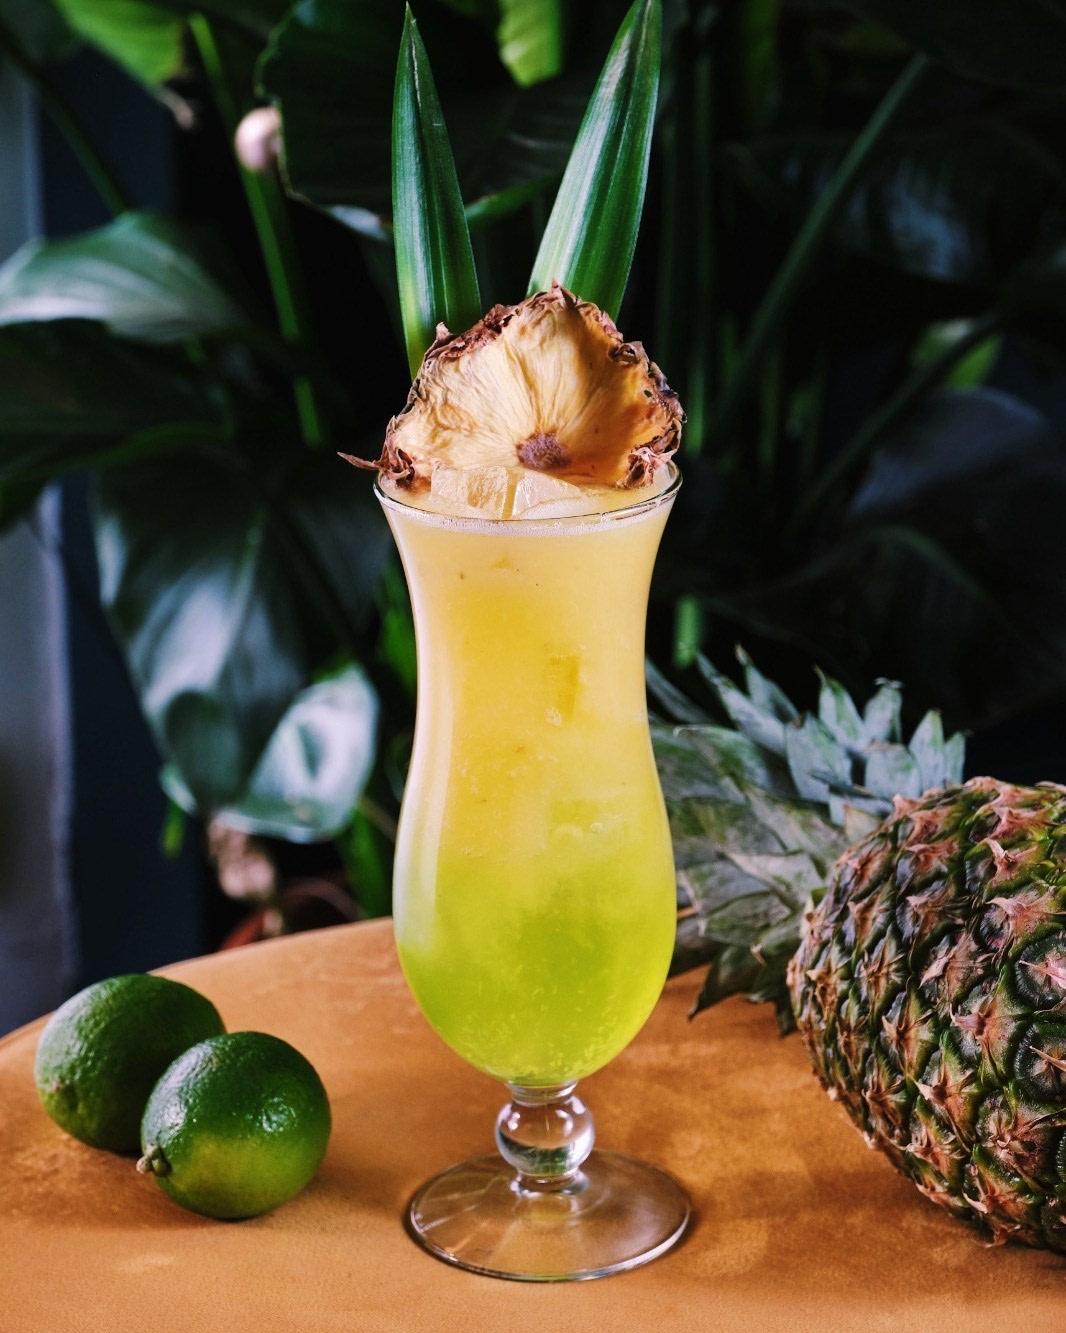 June bug cocktail dependance Gouda